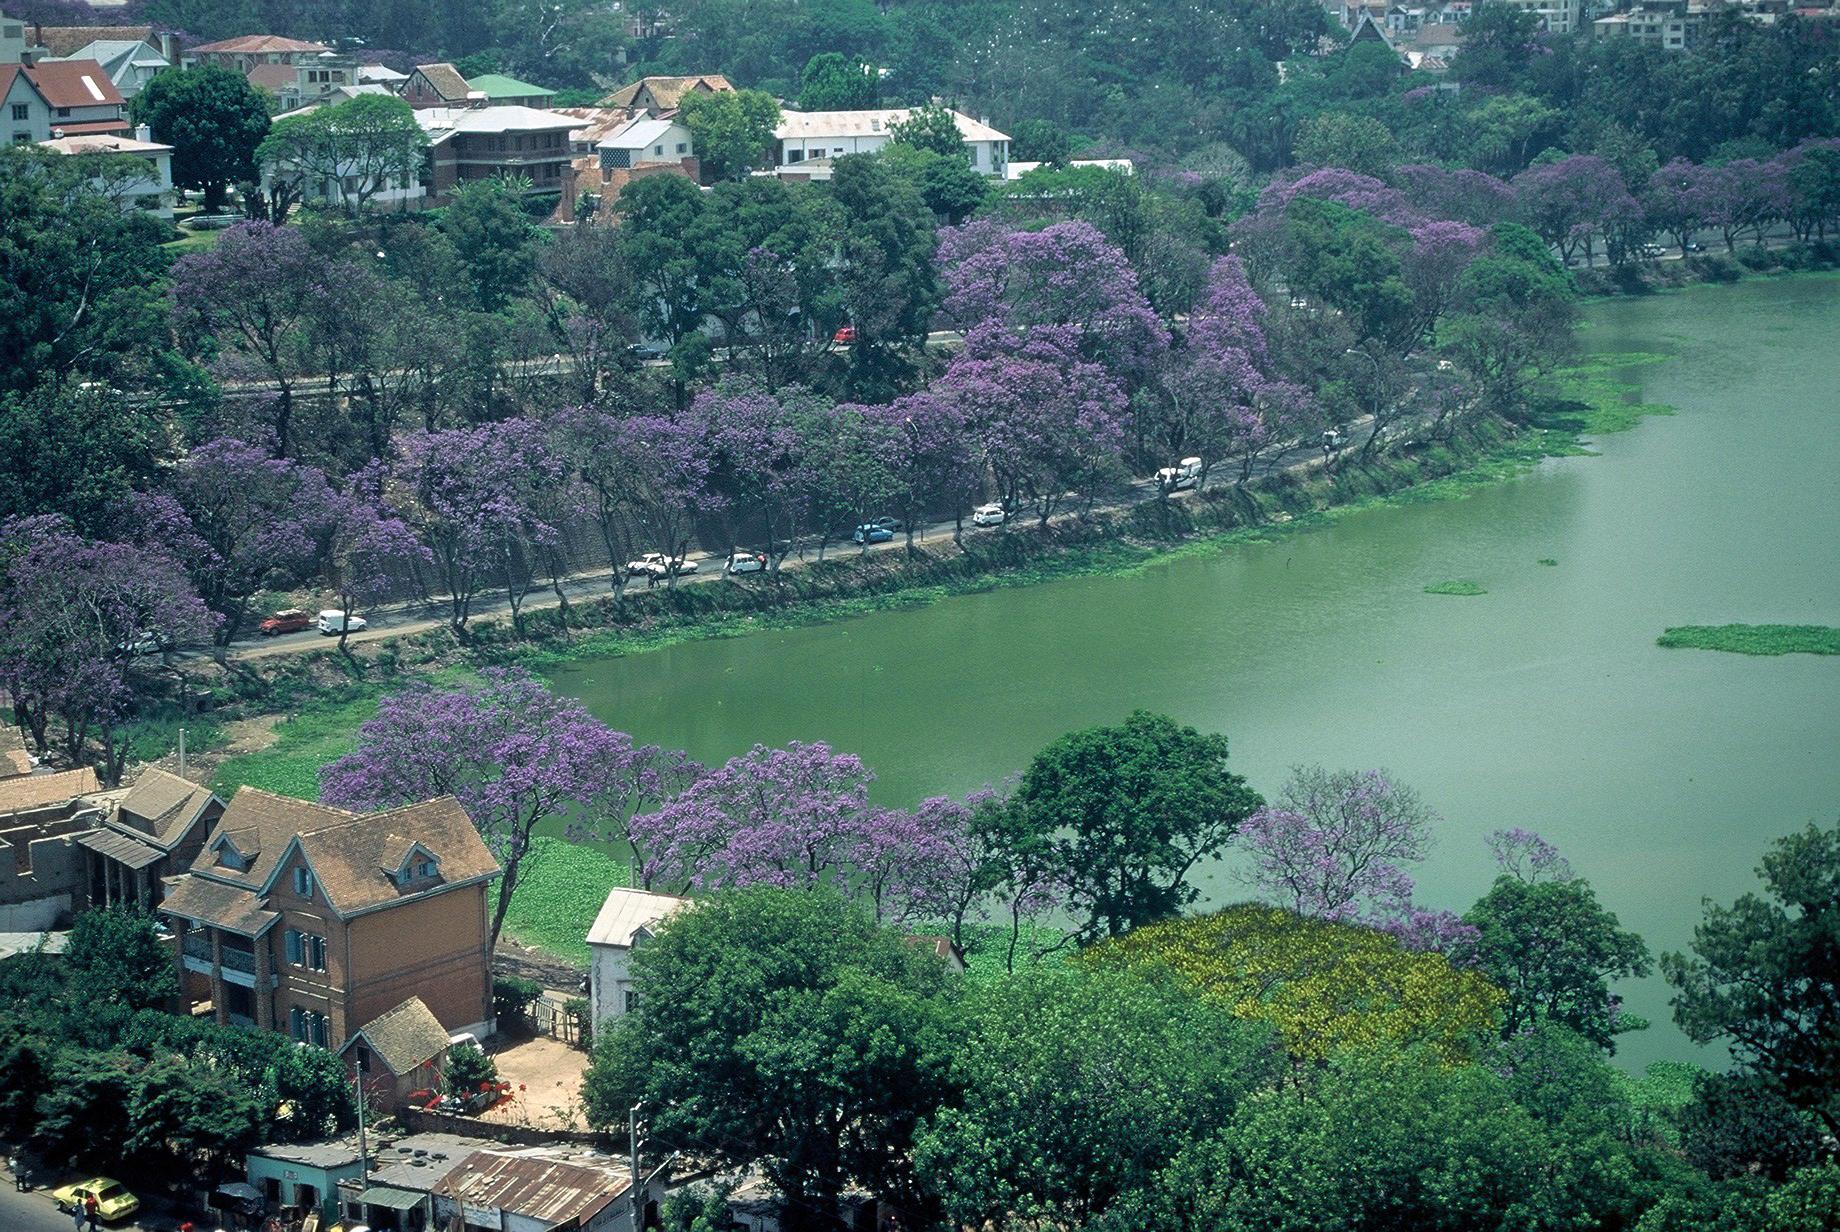 Lac dans la capitale Tananarive (Antananarivo)